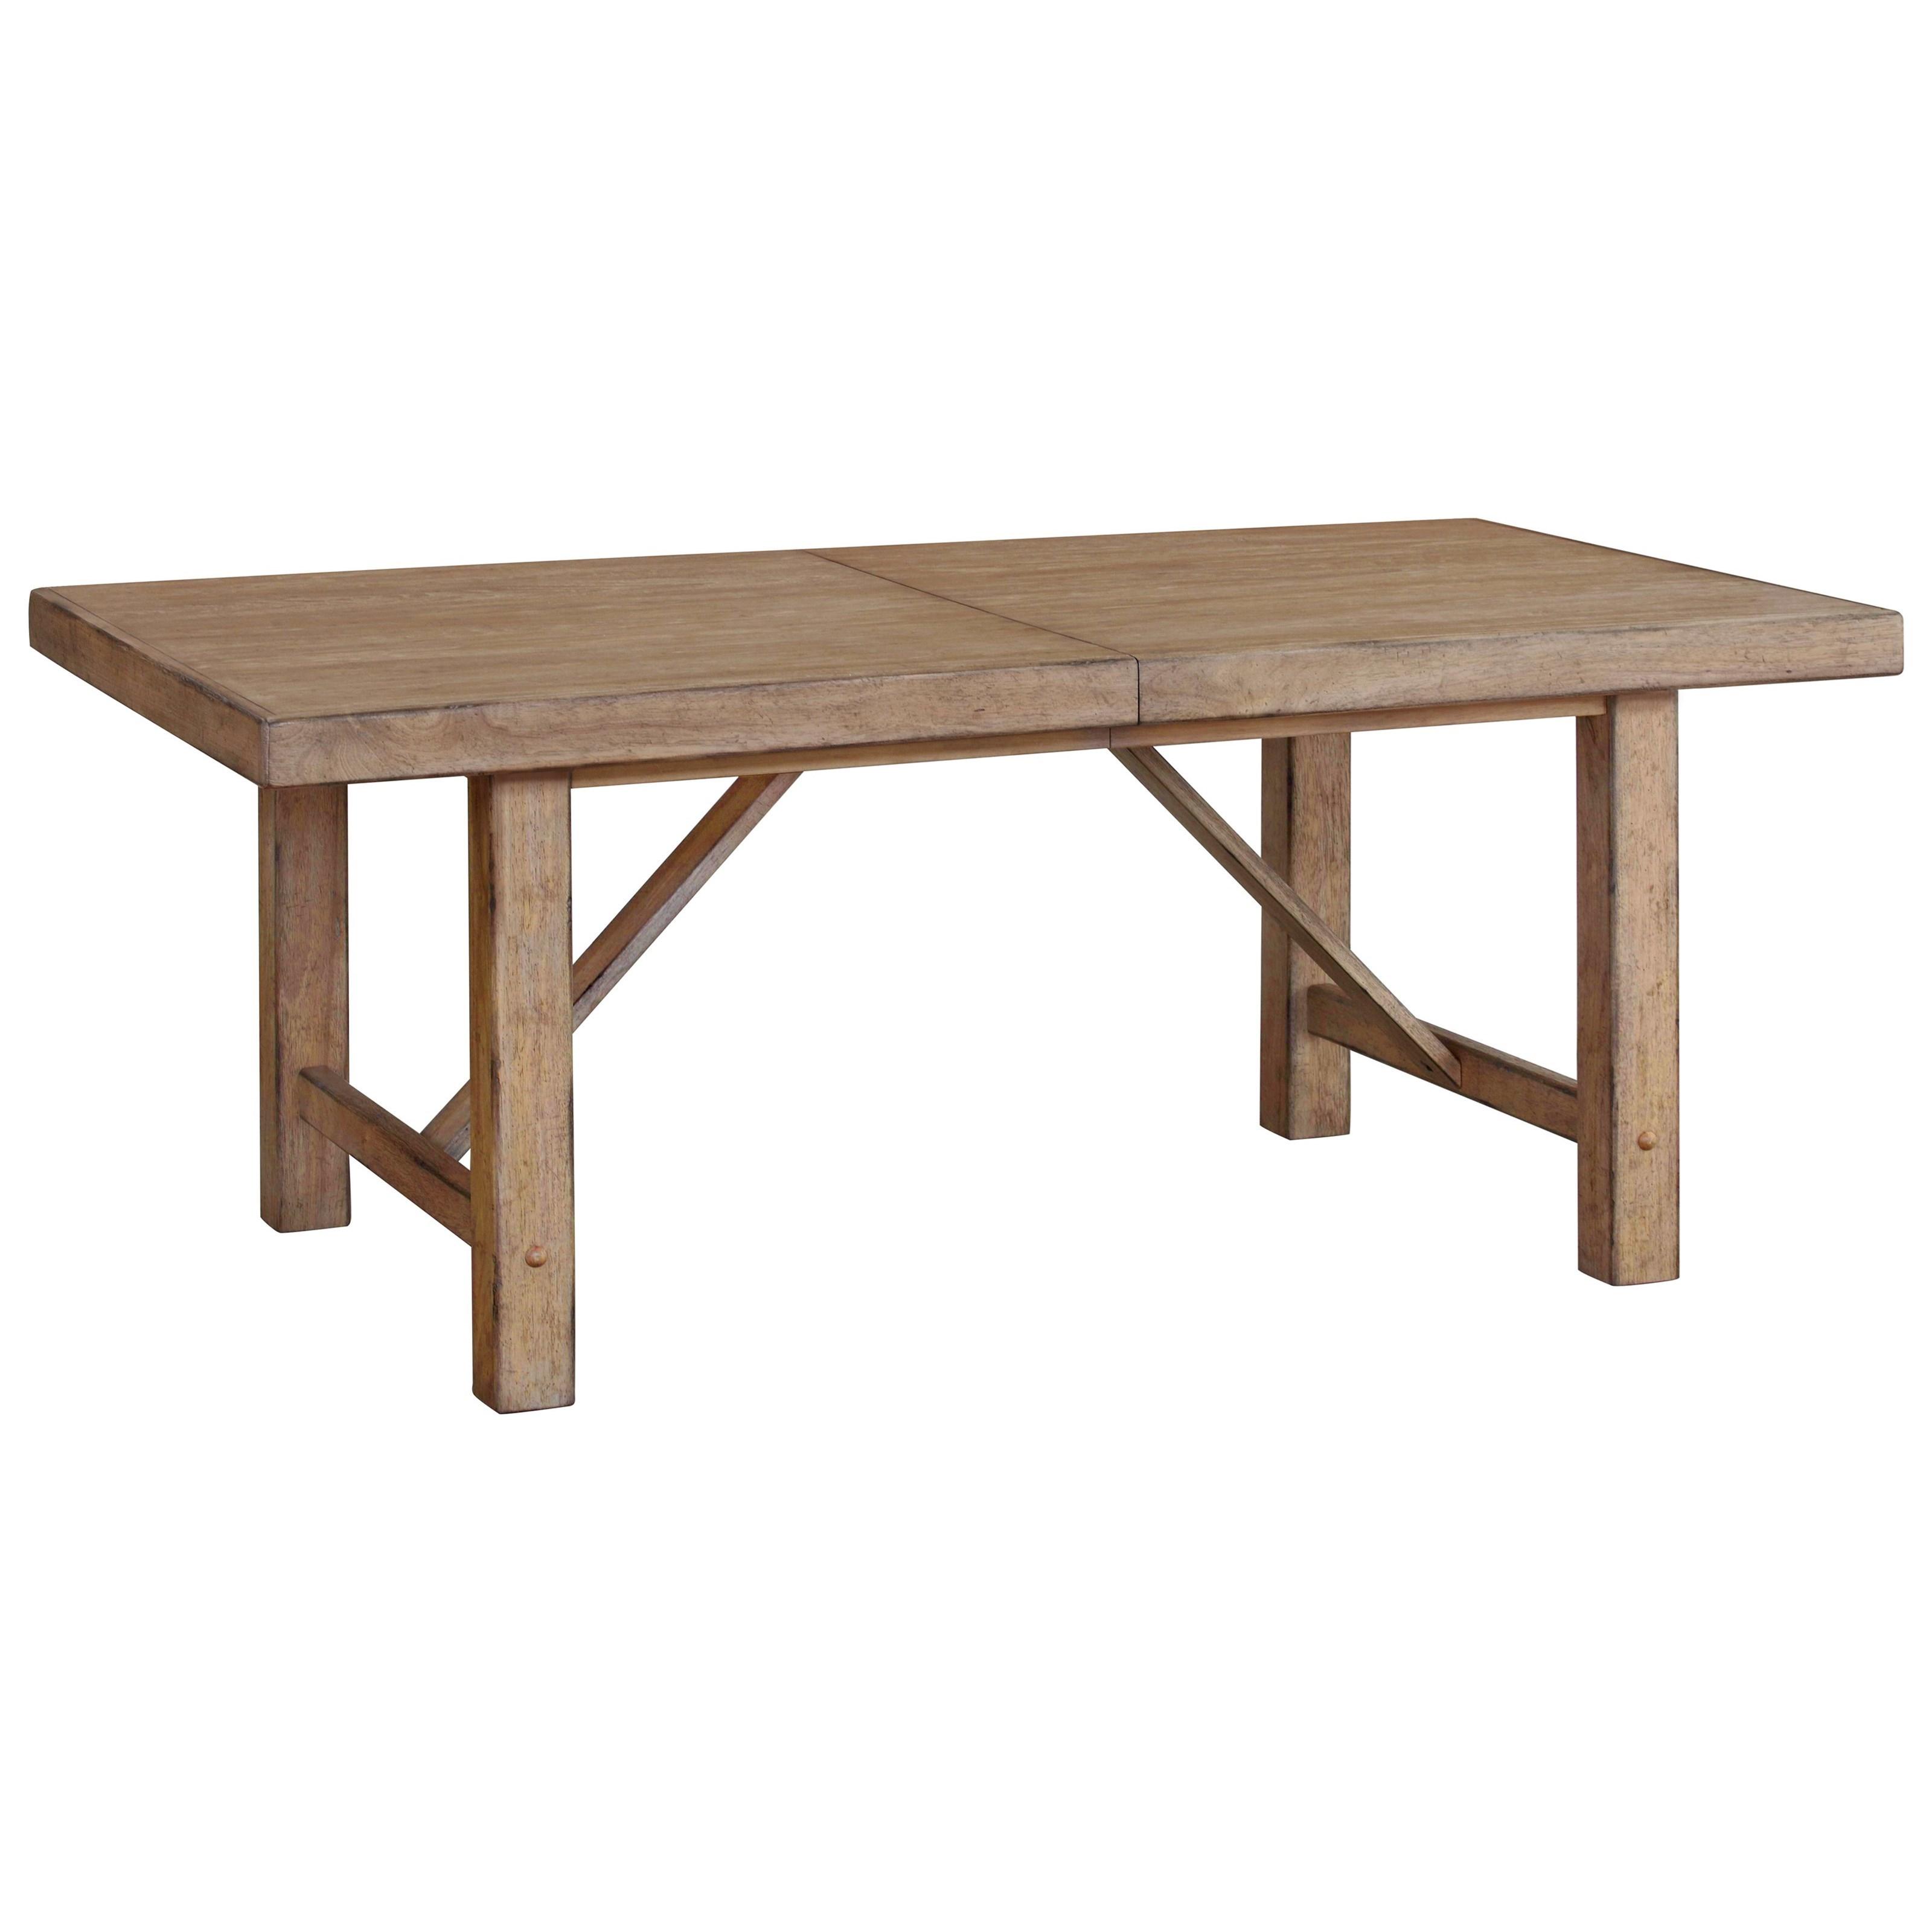 Furniture City Brewing - Blonde Leg Table by VFM Signature at Virginia Furniture Market